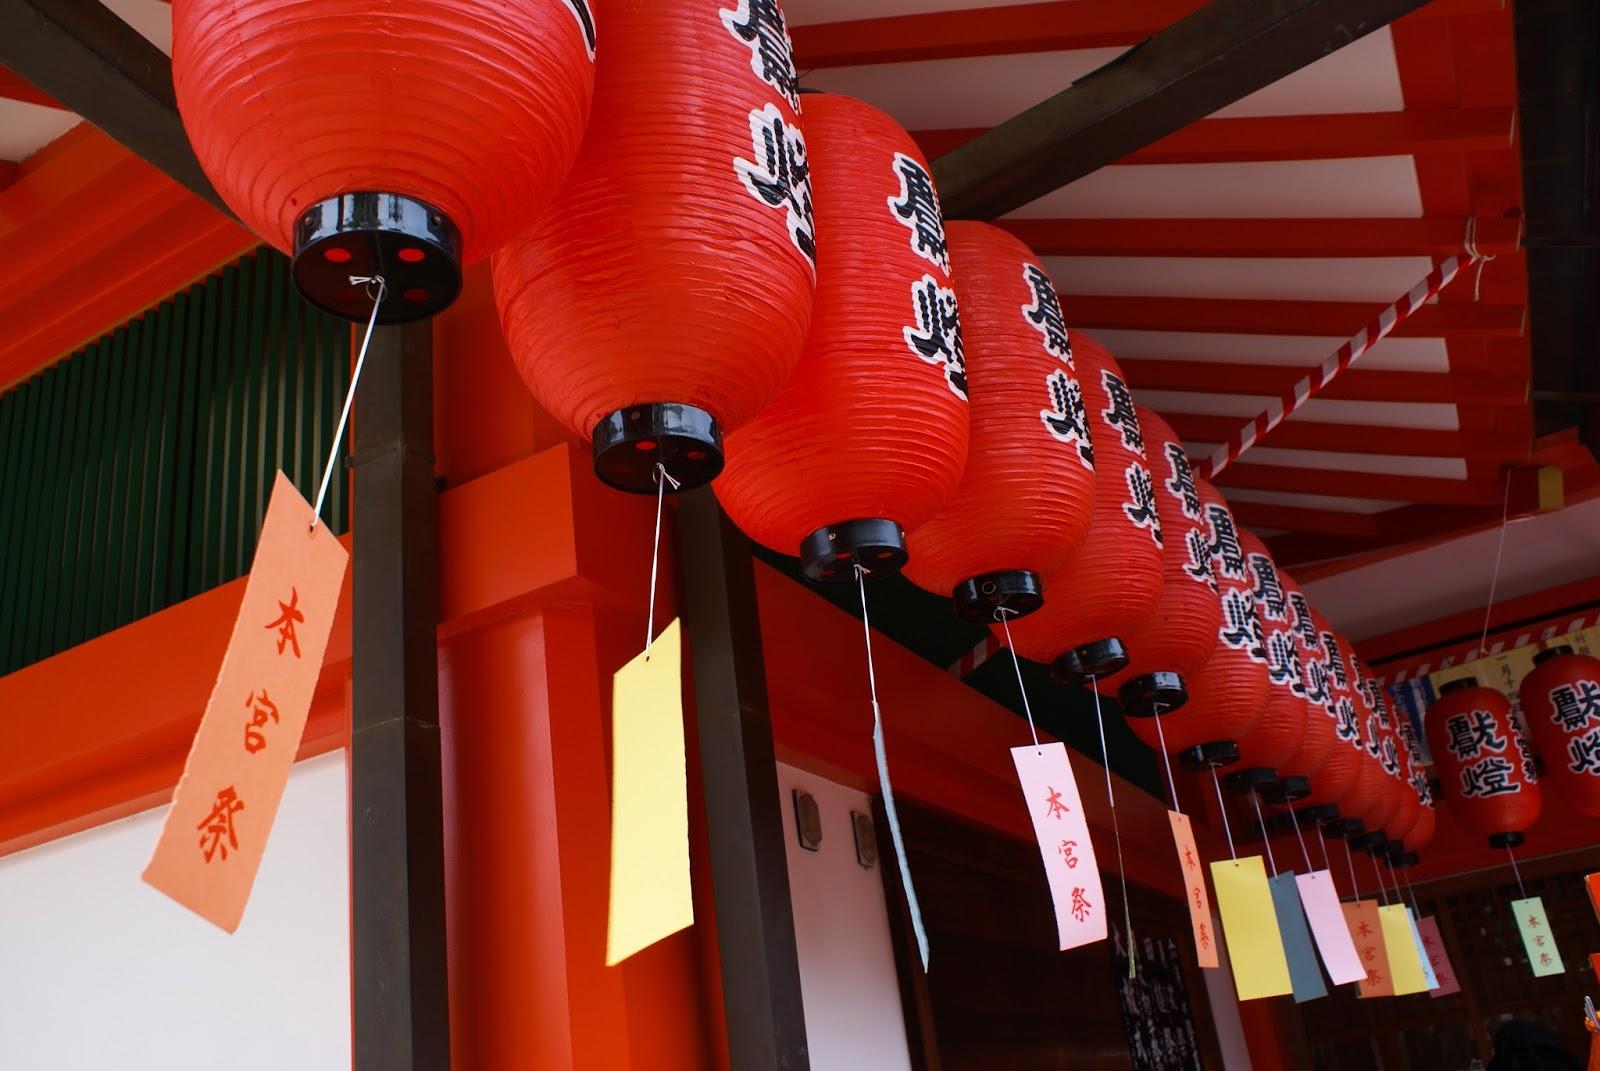 kyoto fushimi inari japon lanterne